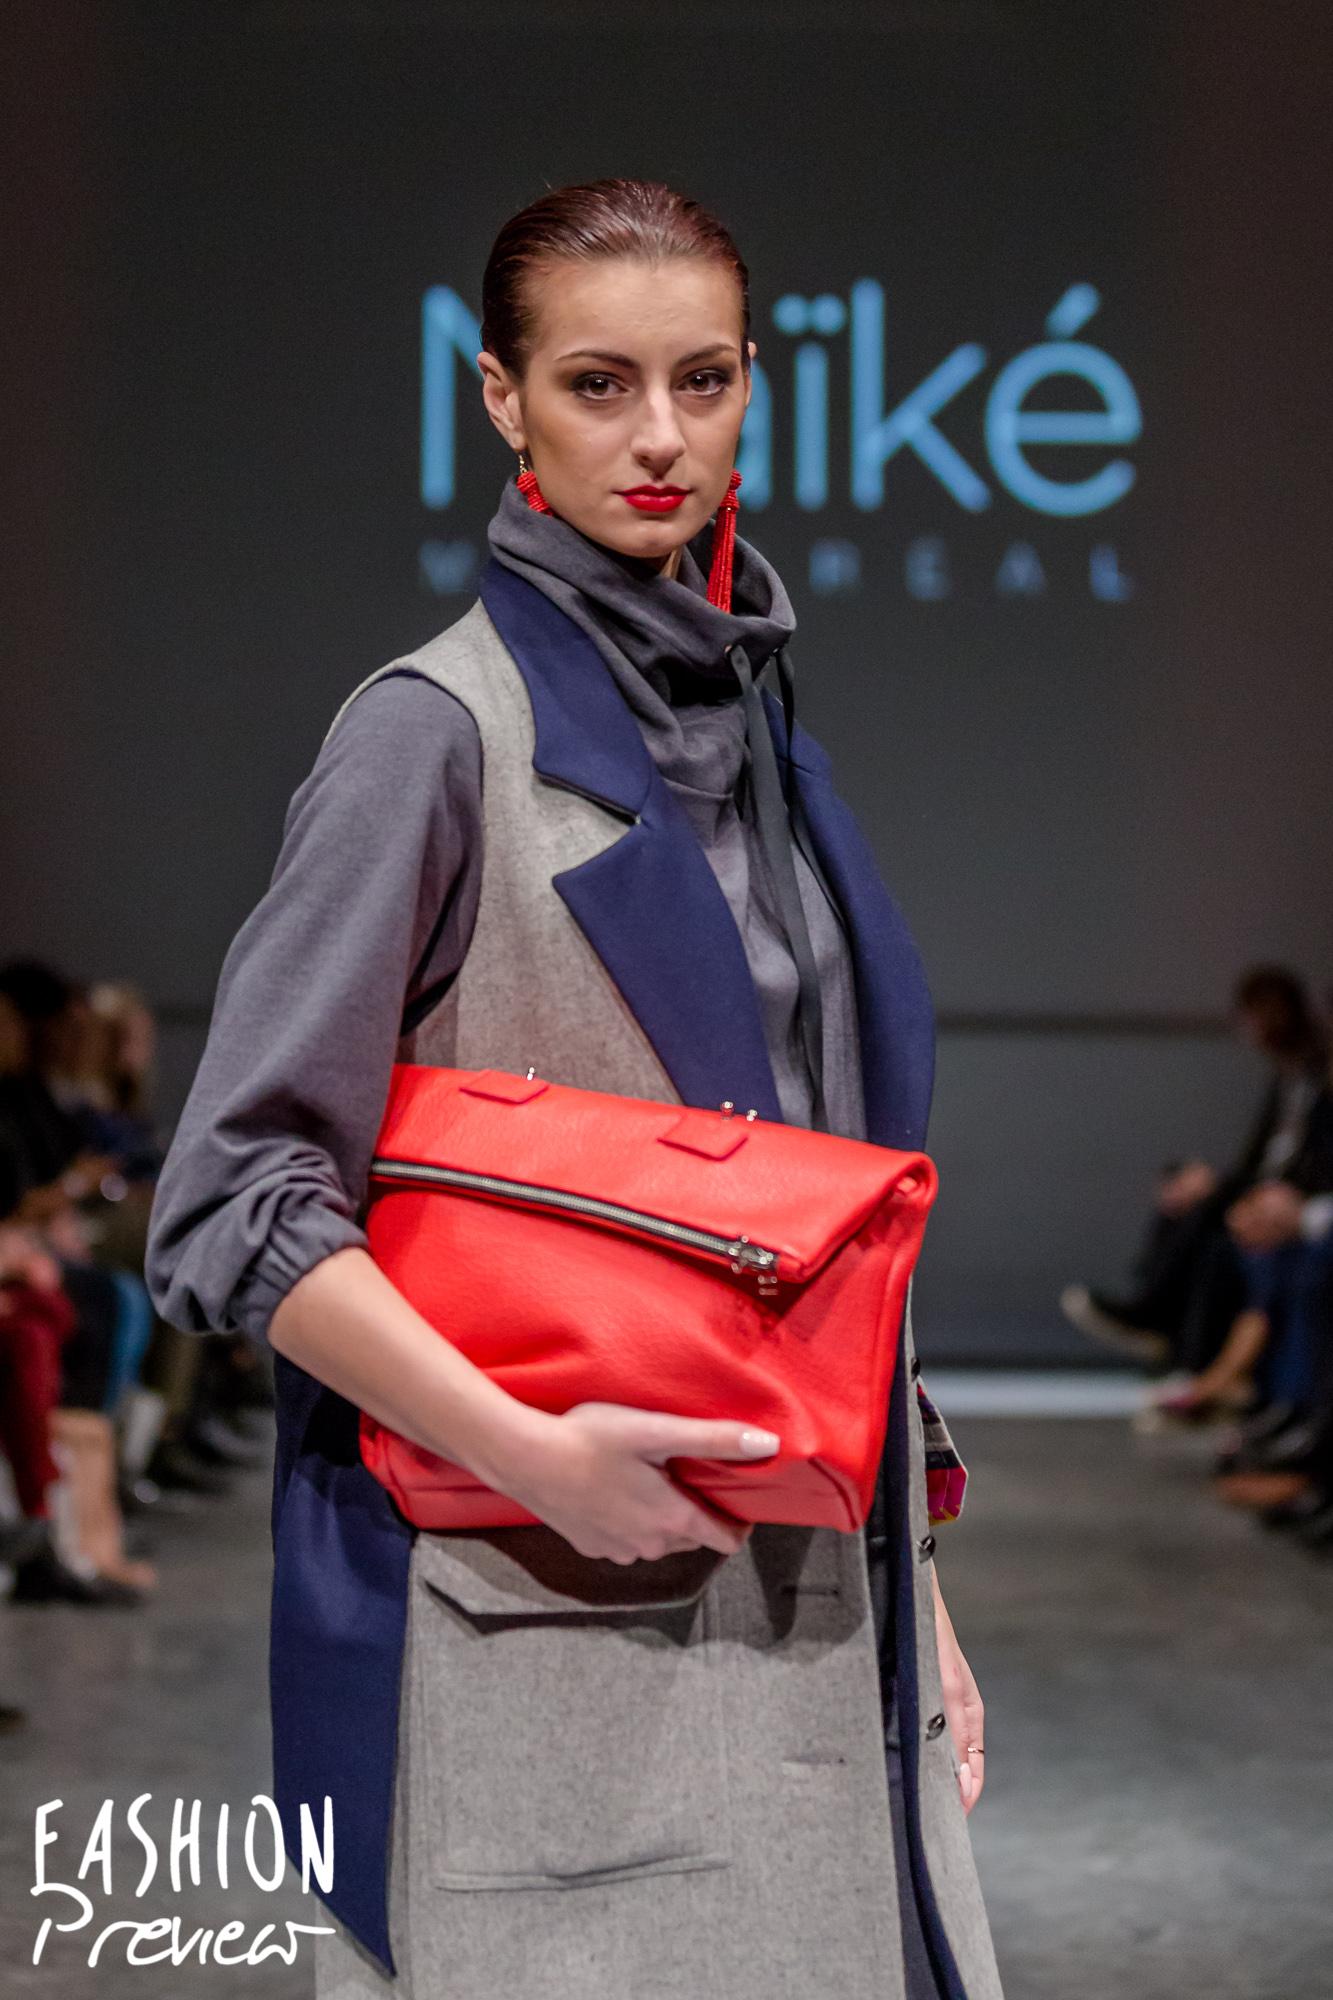 Fashion Preview 9 - Naike-27.jpg